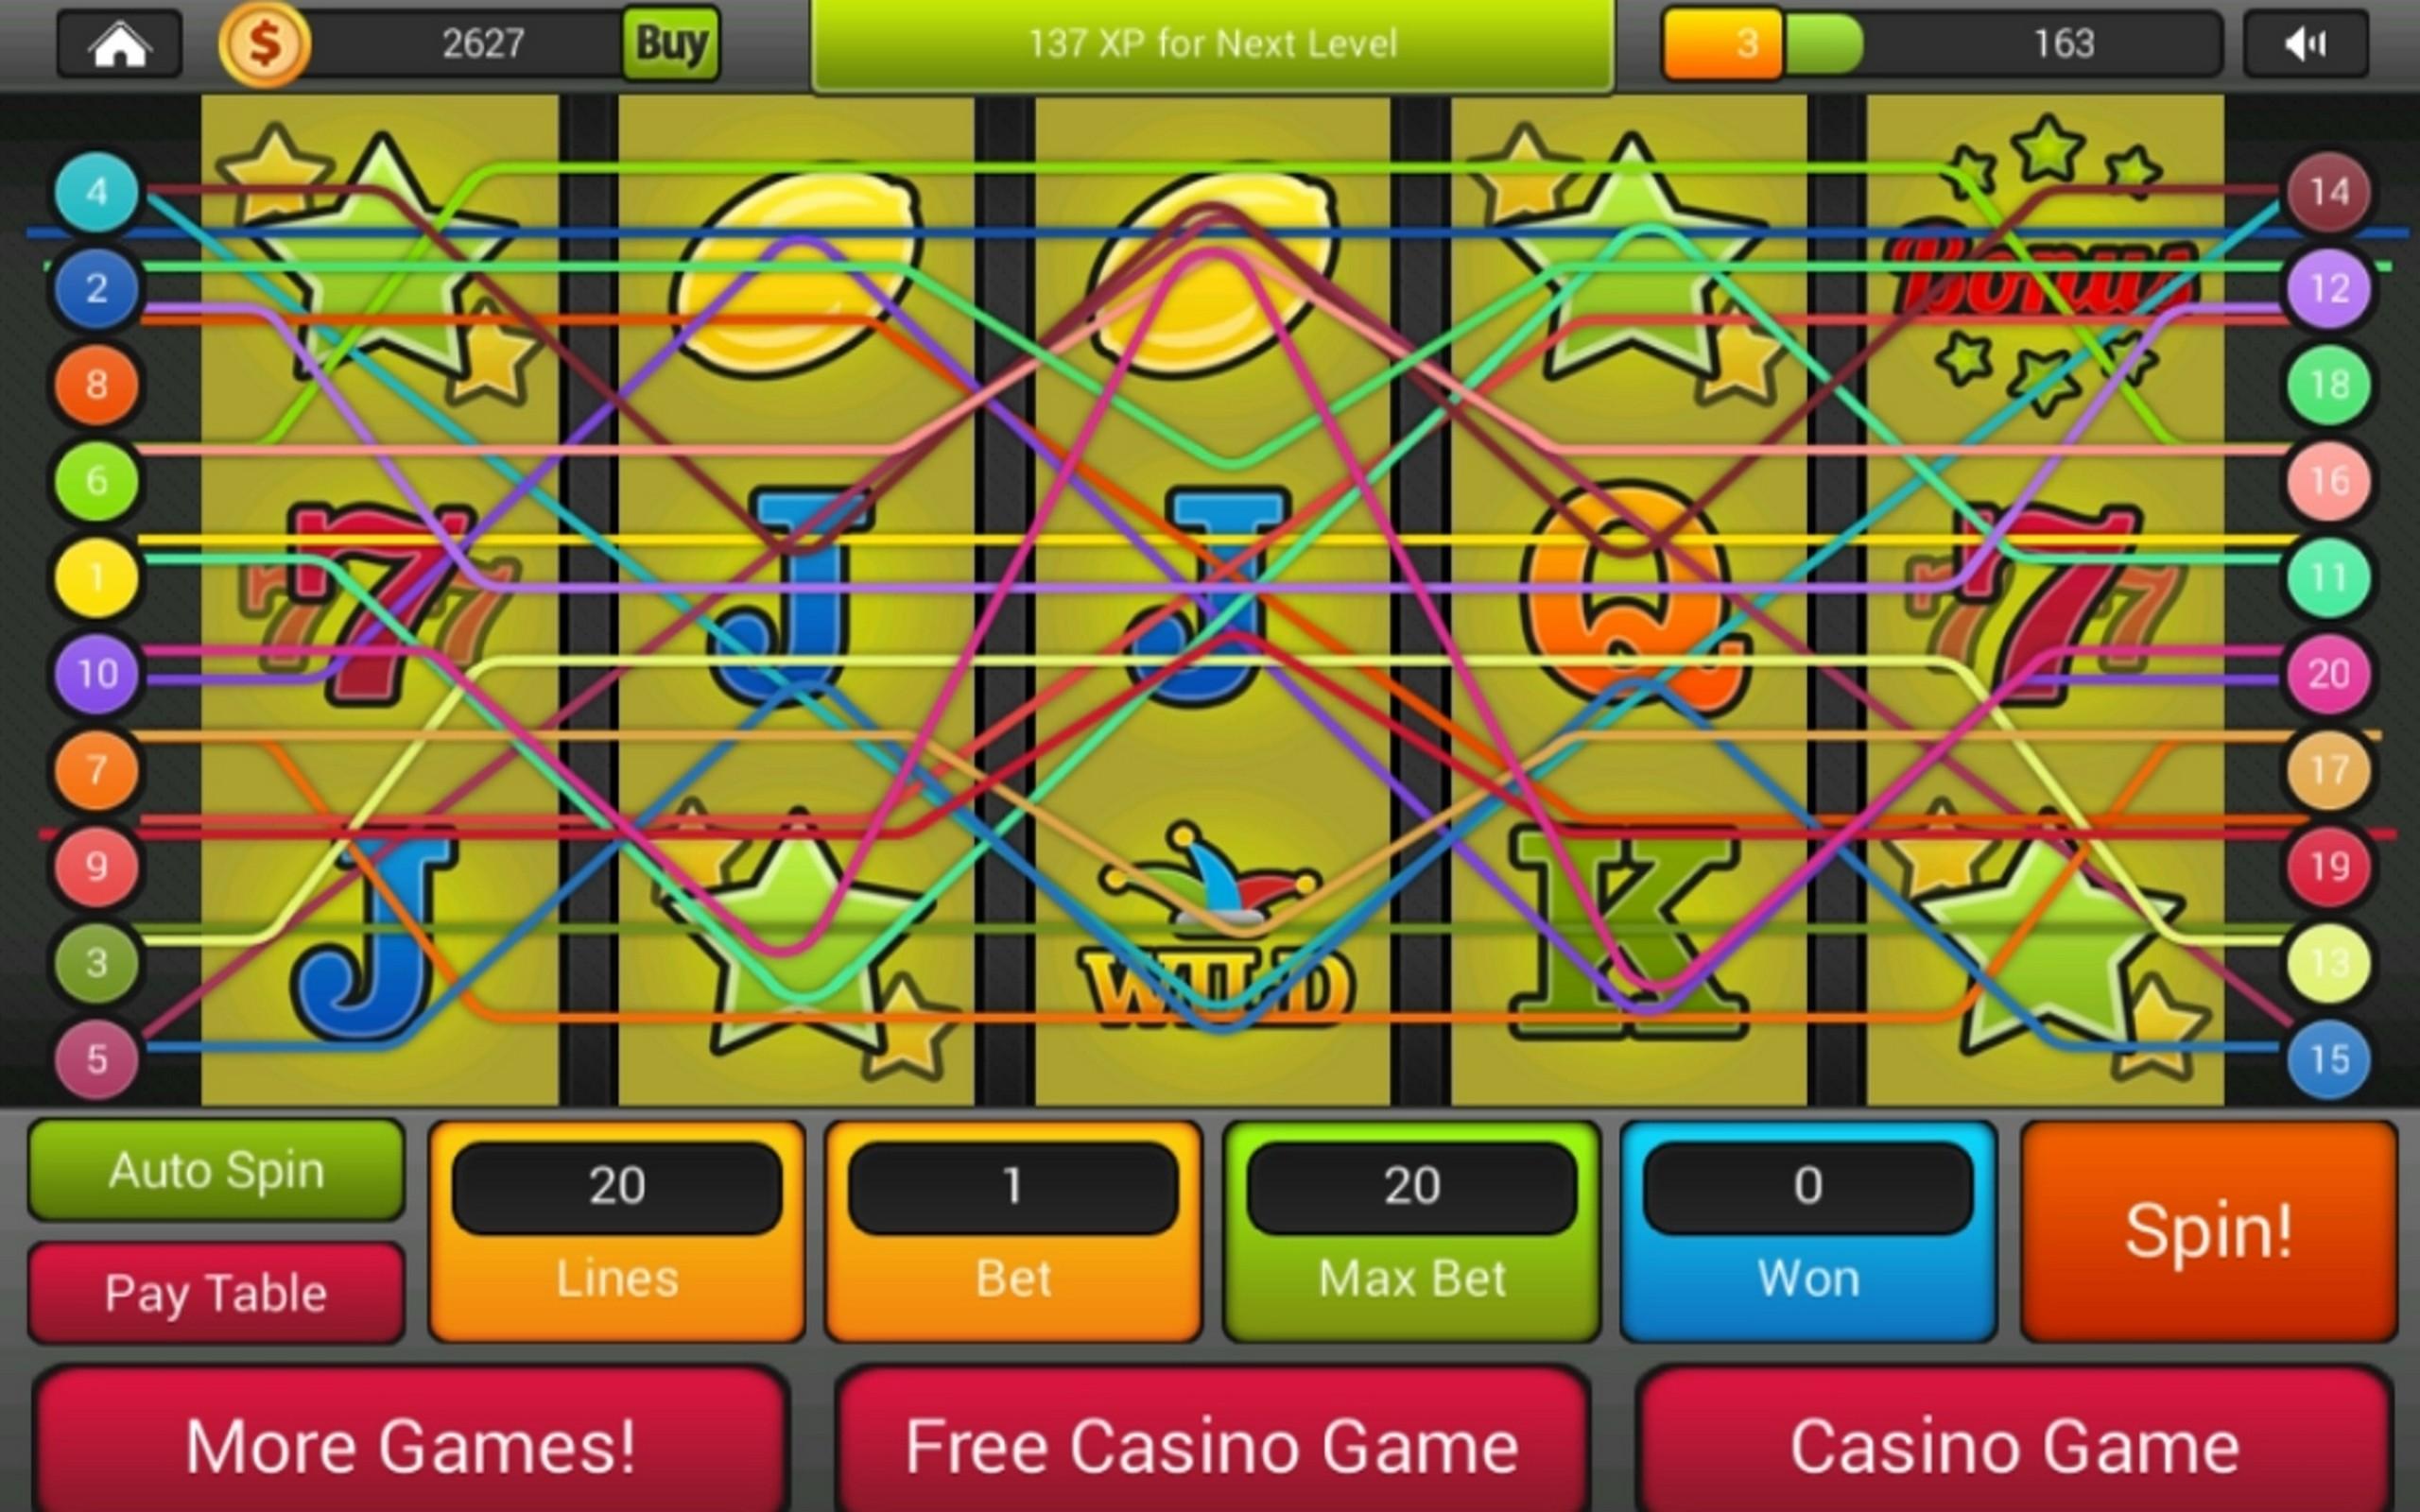 spielautomaten app android kostenlos